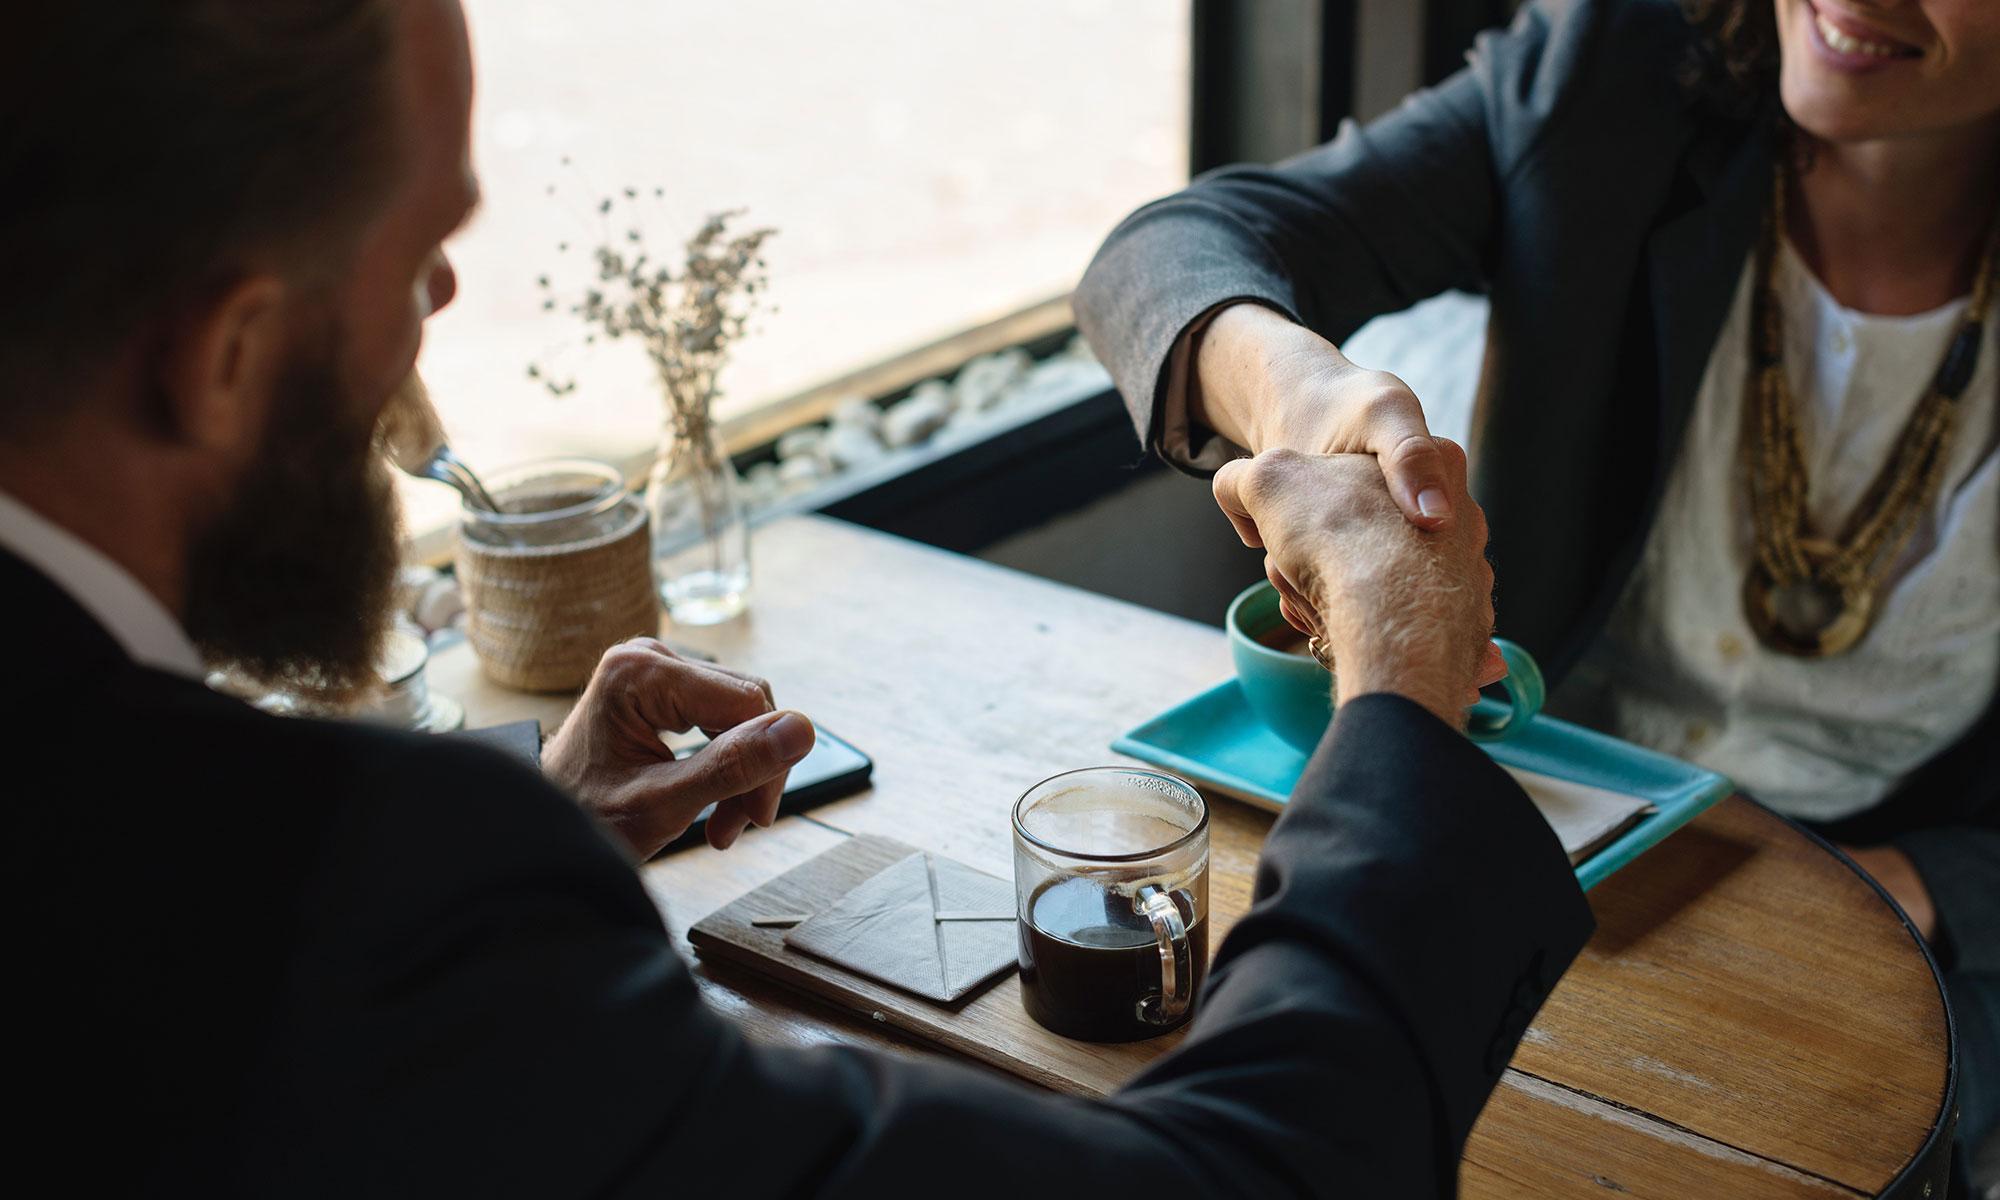 6 Simple Ways to Make Your Mentorship Program a Huge Success